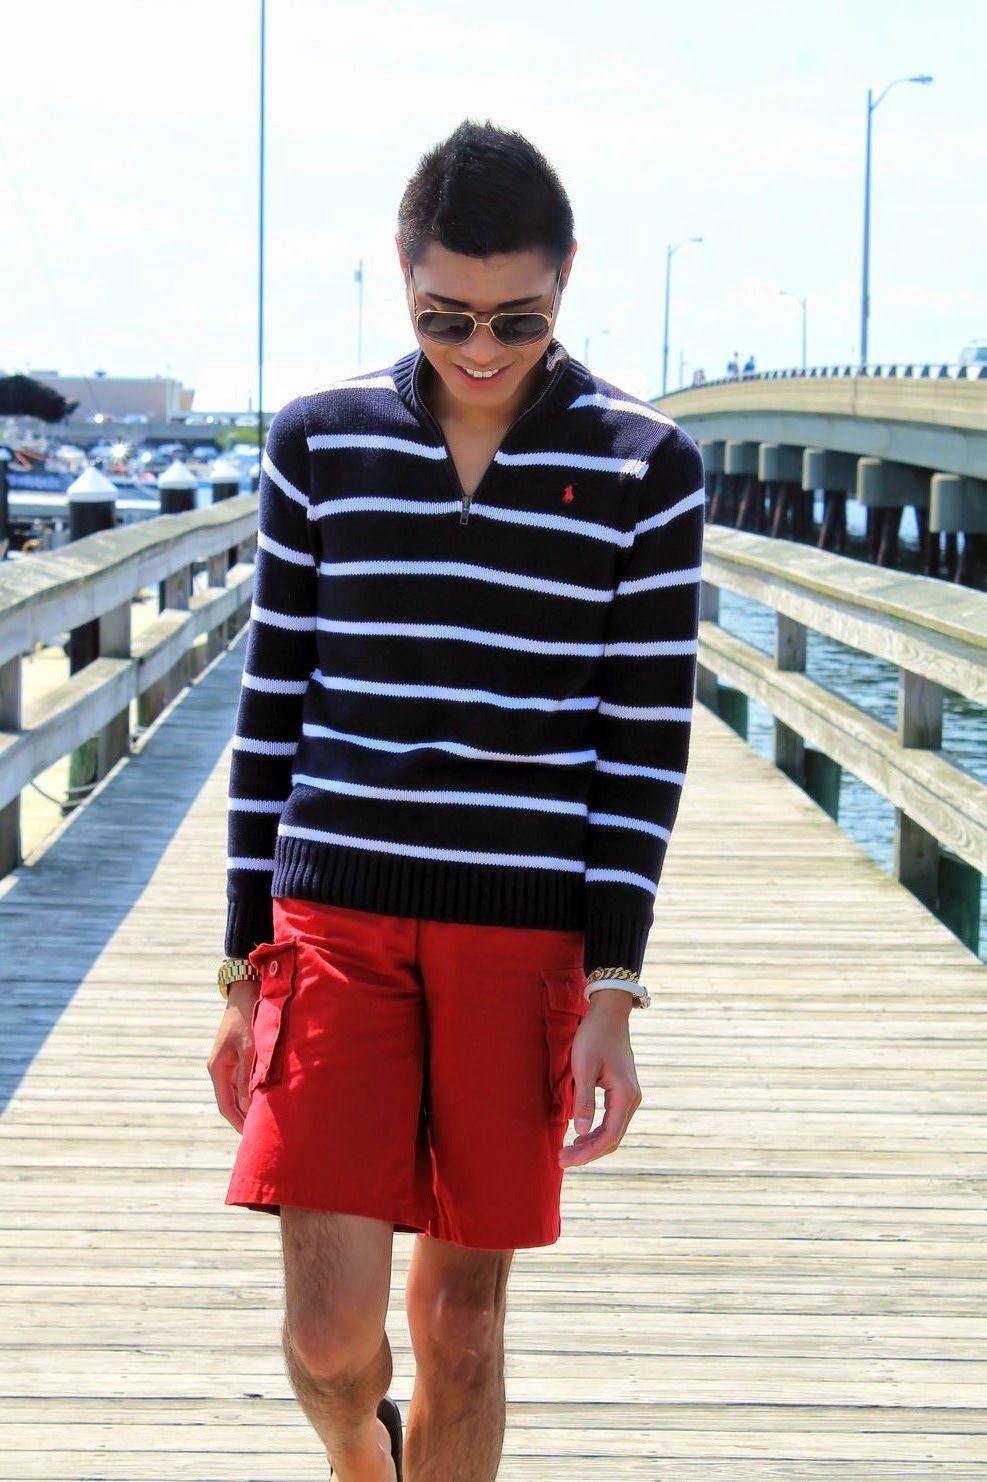 Nautical Casual Summer Mens Look | Zion Dejano